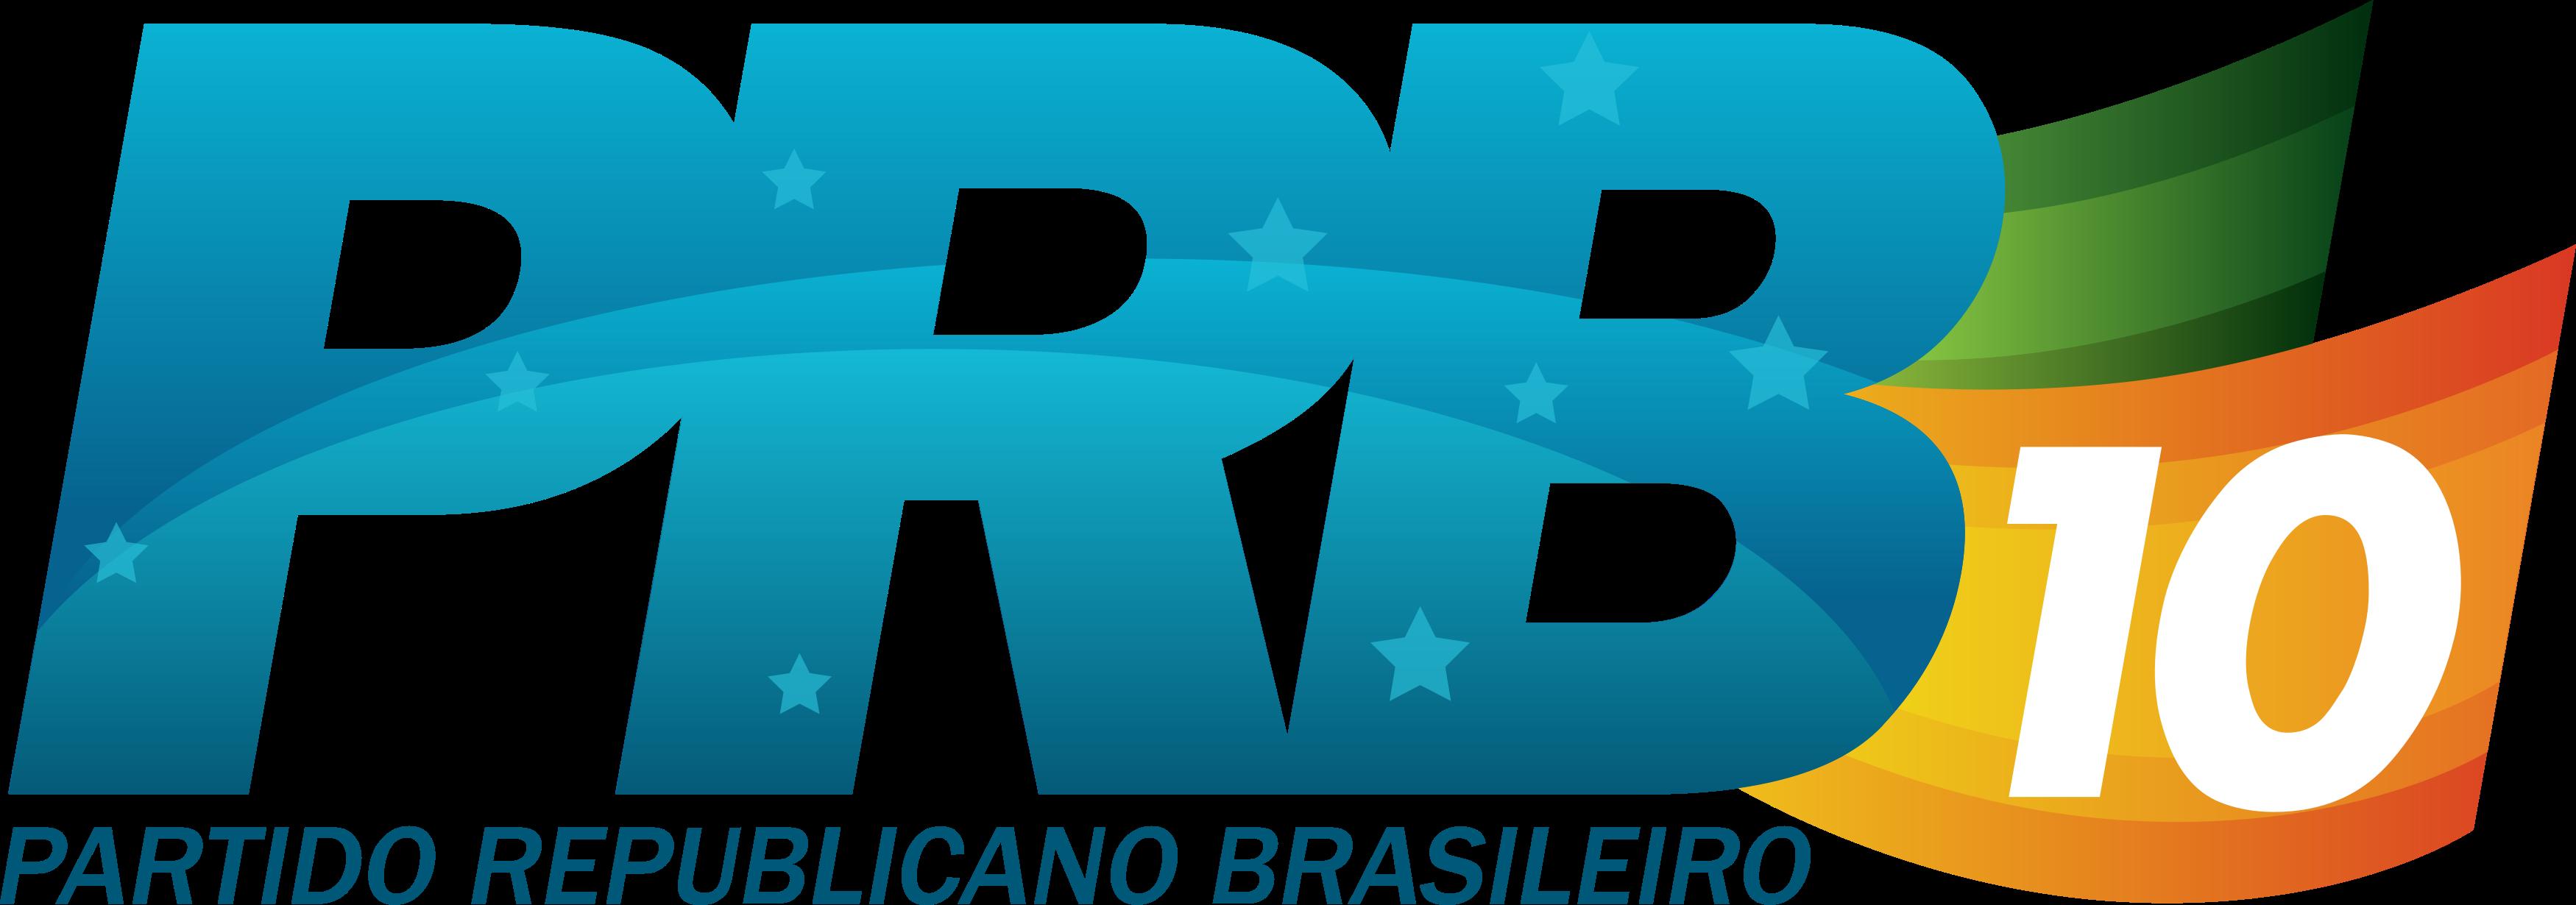 PRB Logo, Partido Republicano Brasileiro Logo.